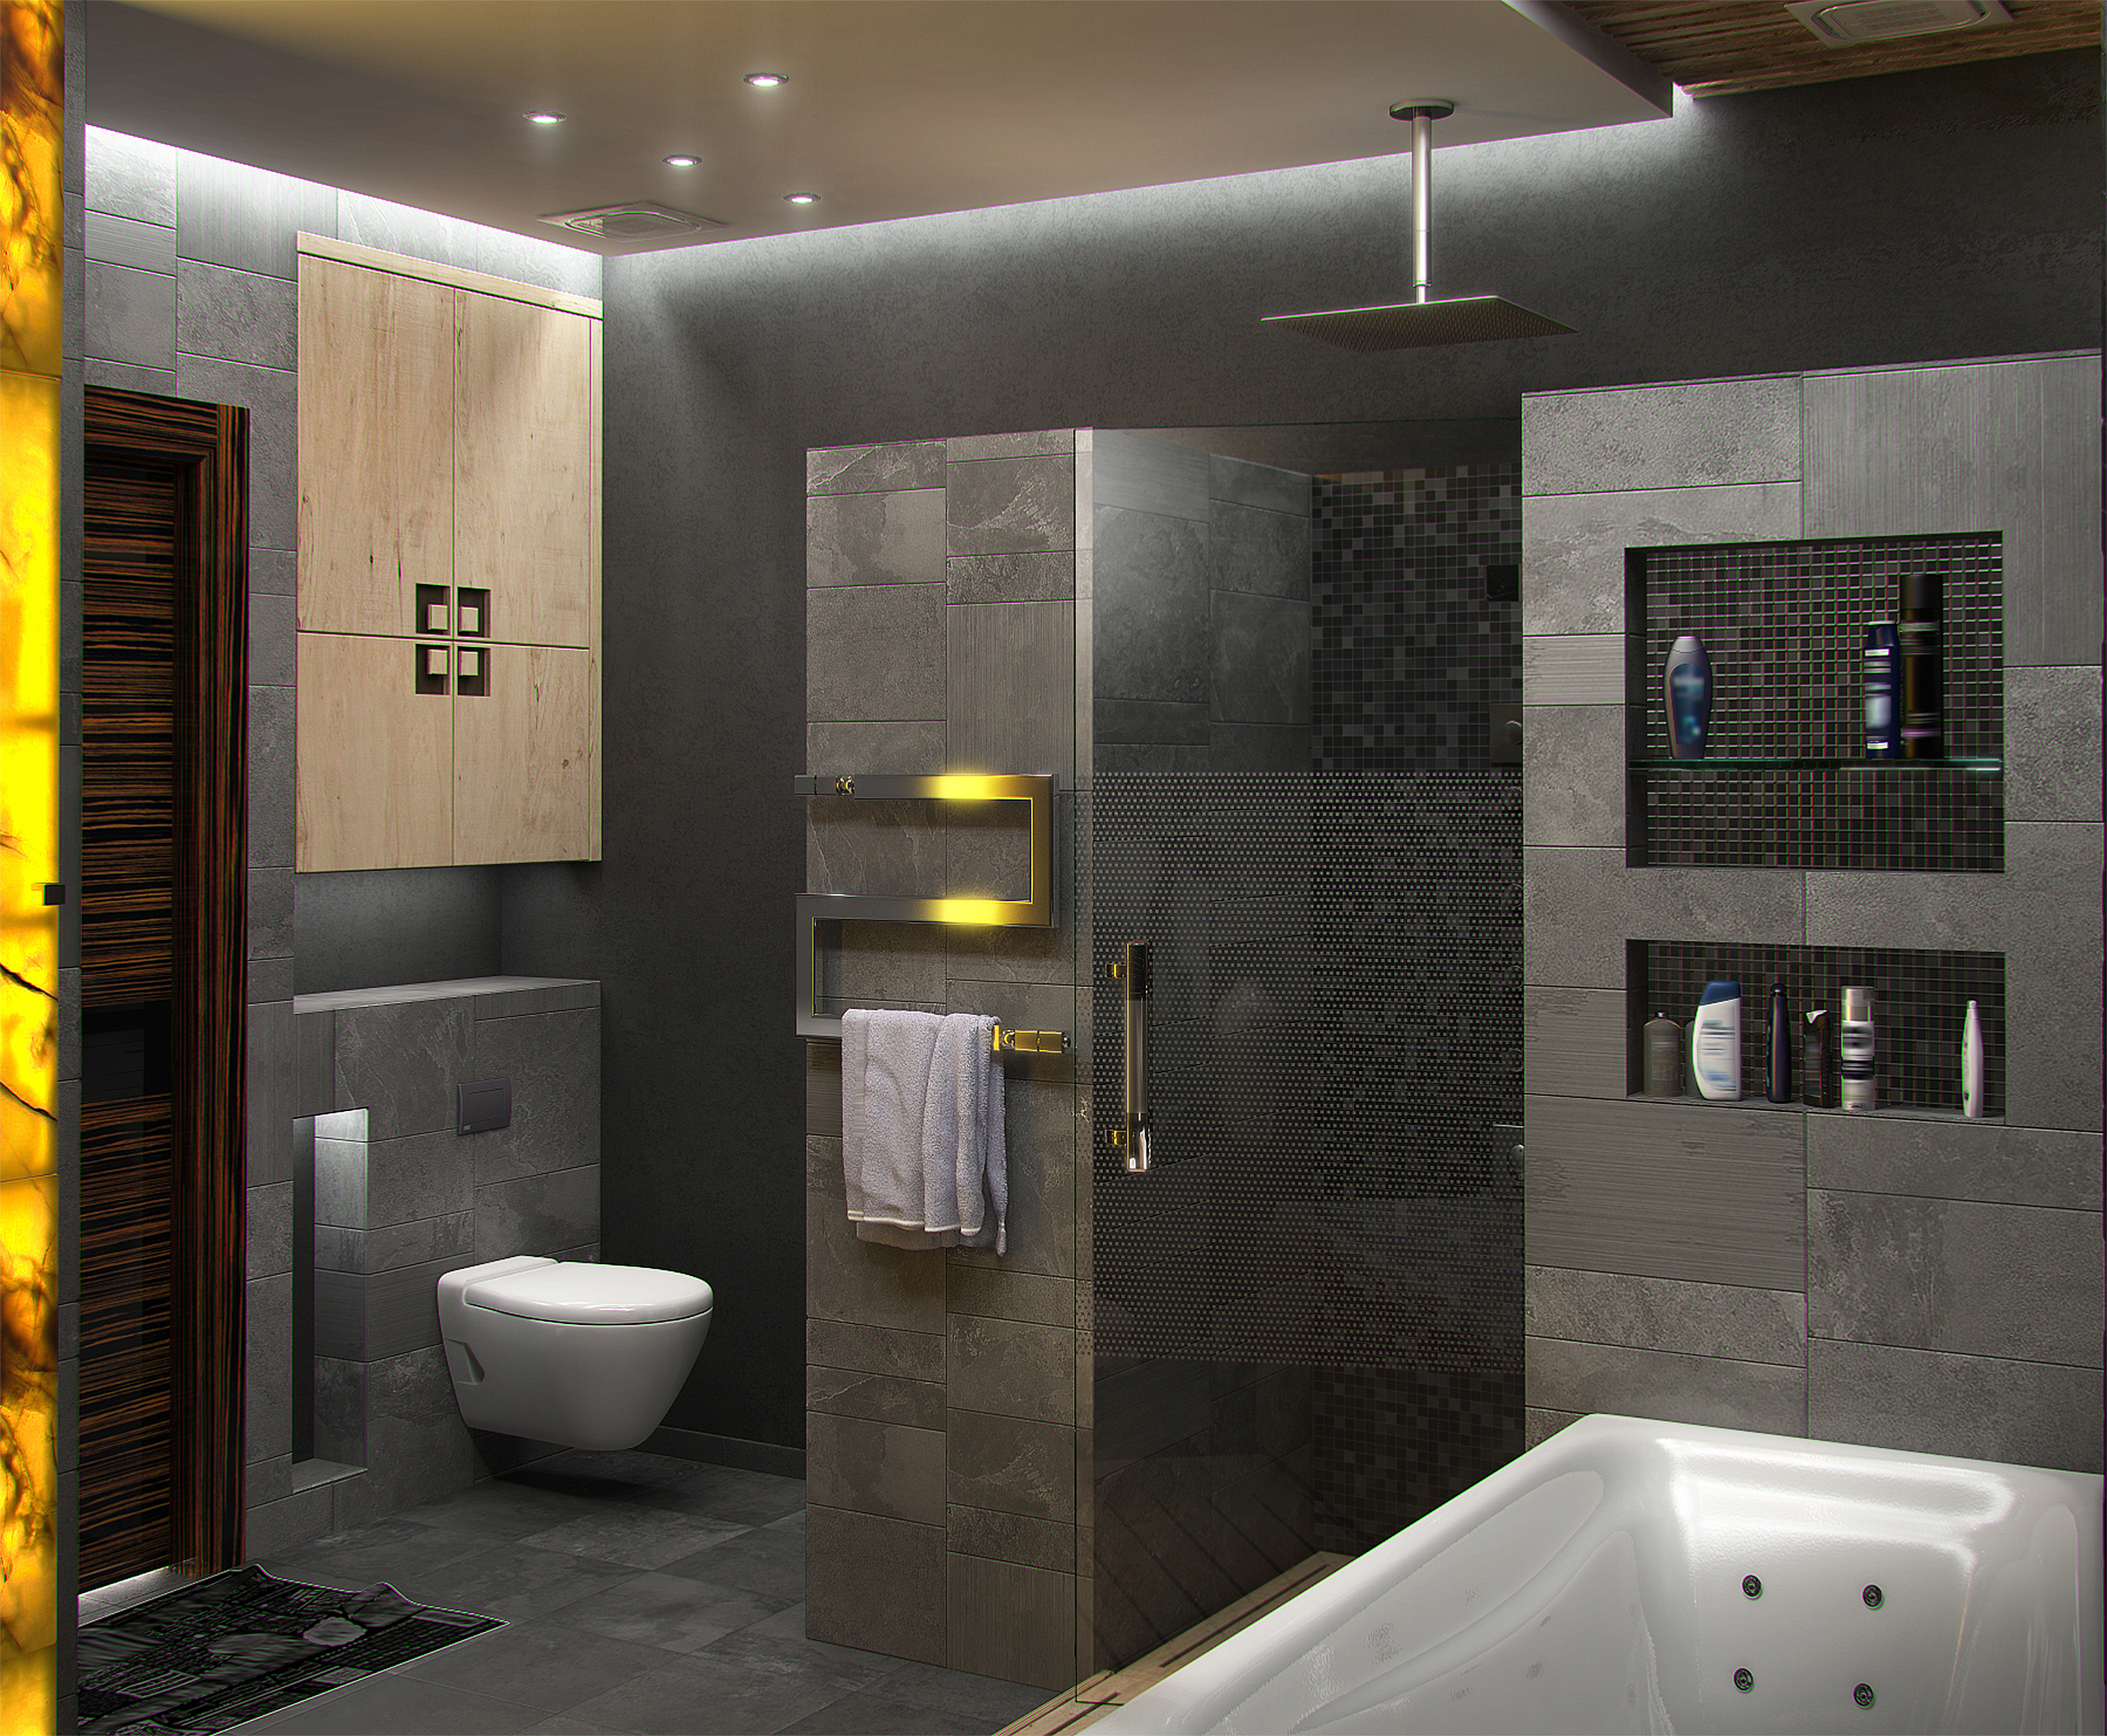 Salle de bain avenue melville ozen lectrique for Plan electrique salle de bain